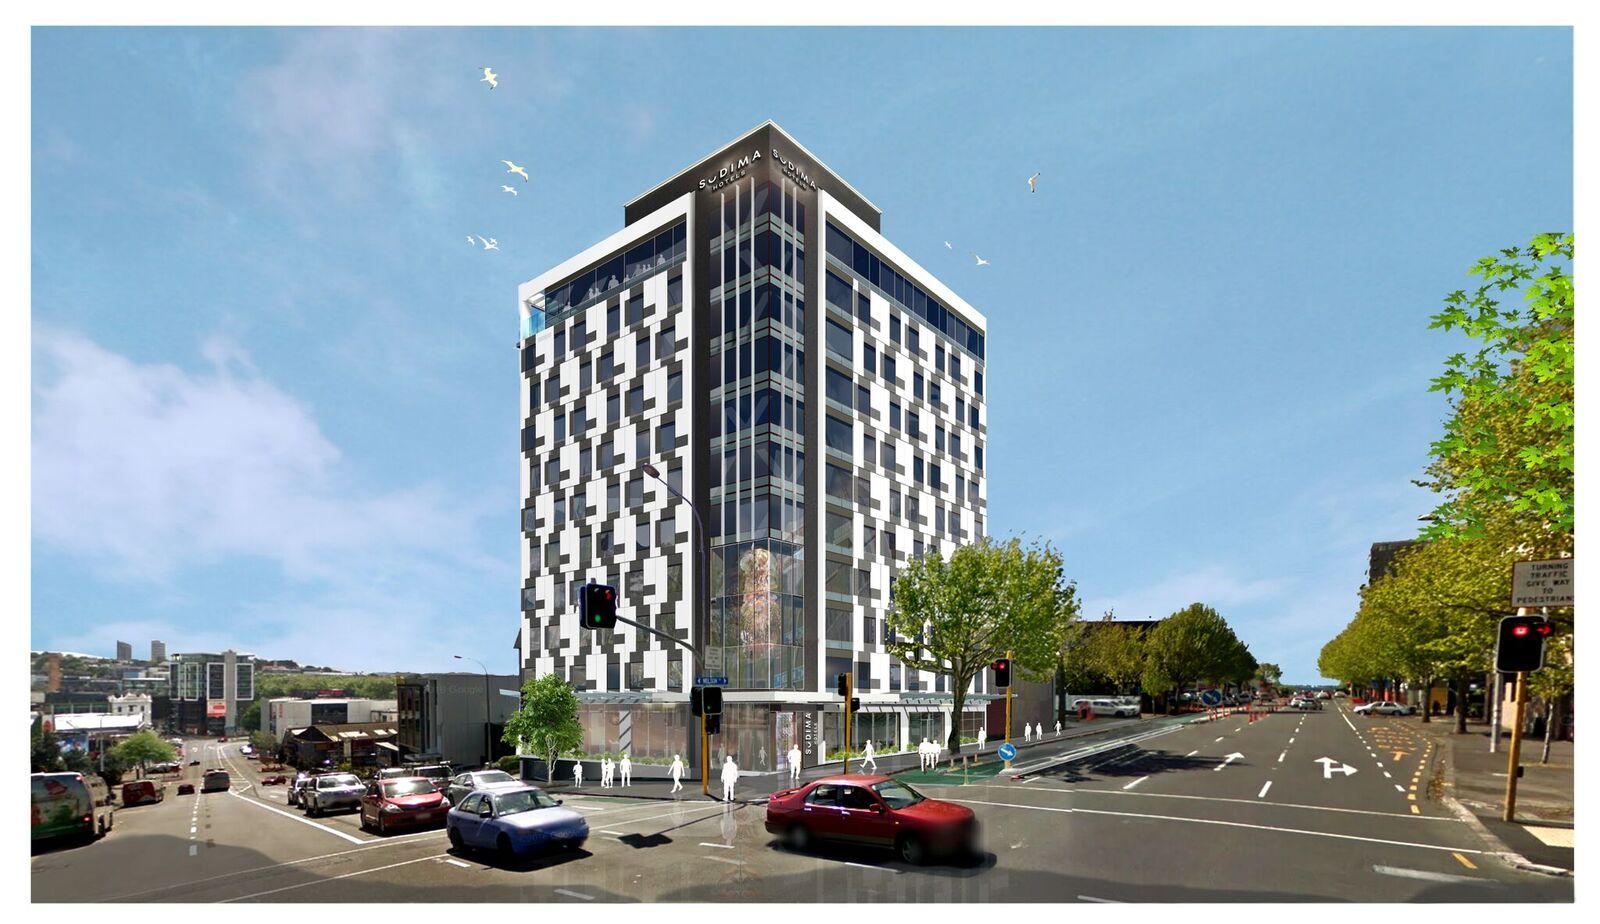 Artist's impression of the Auckland CBD Sudima hotel at daytime.